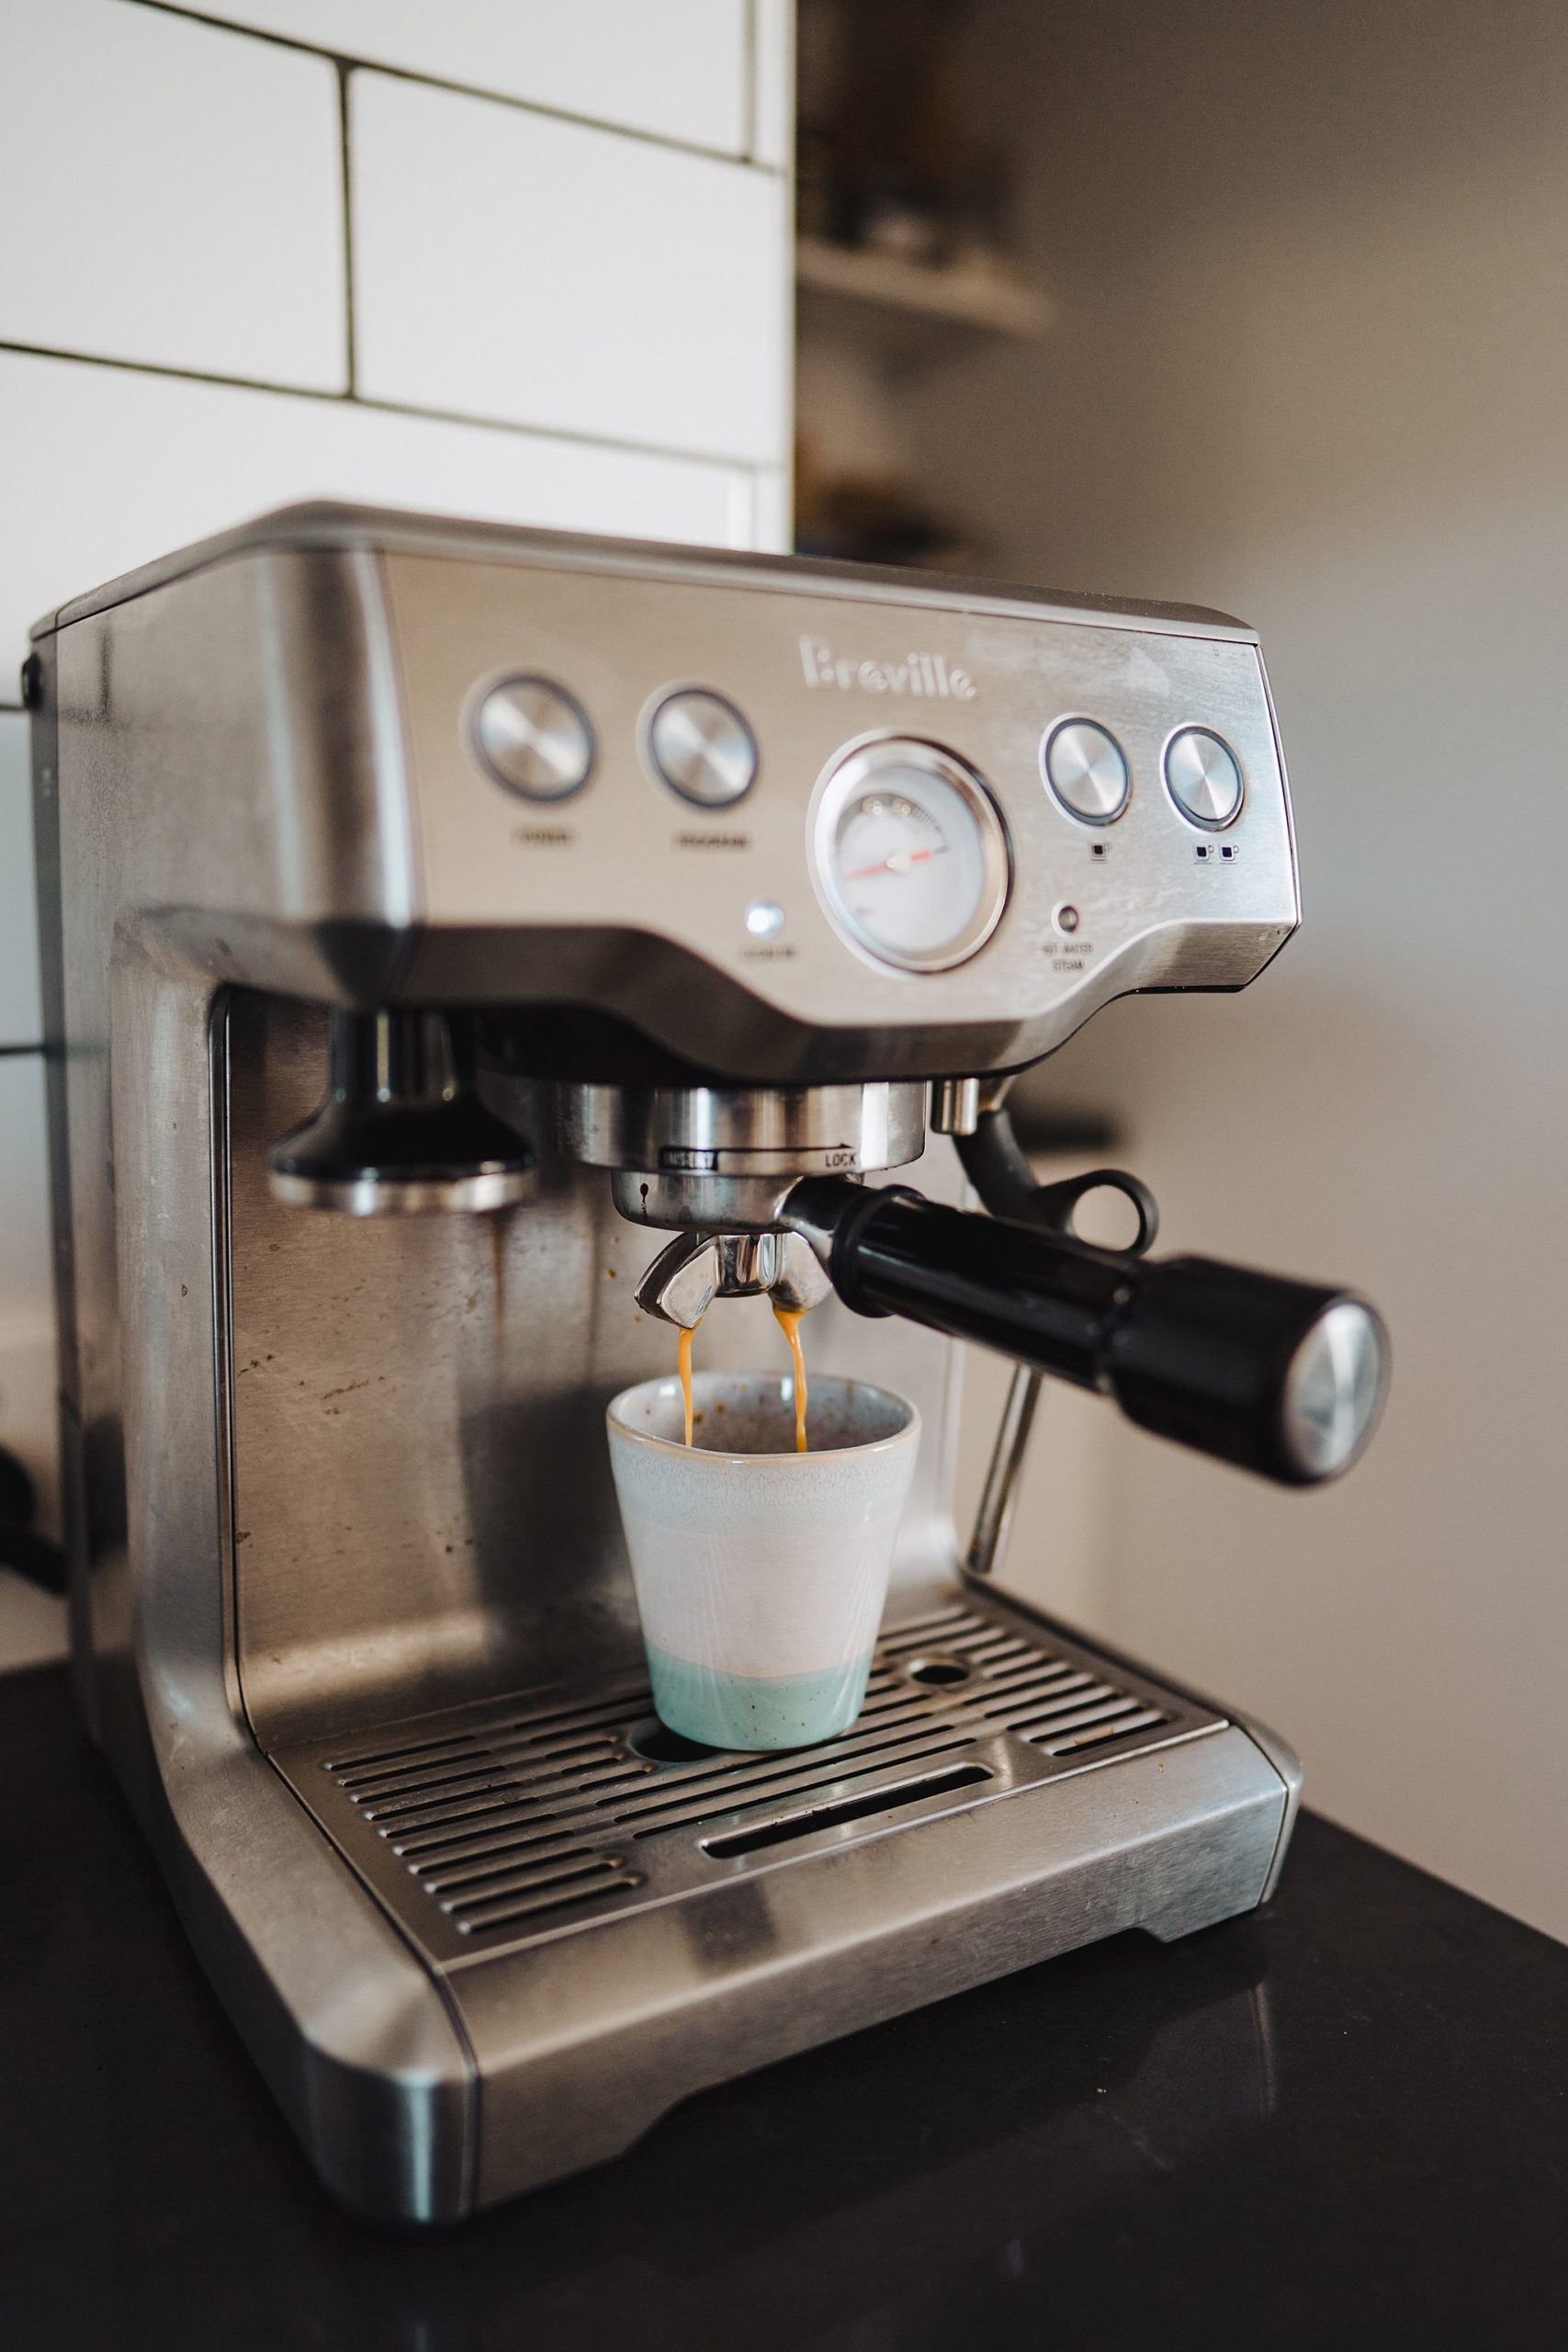 making an espresso